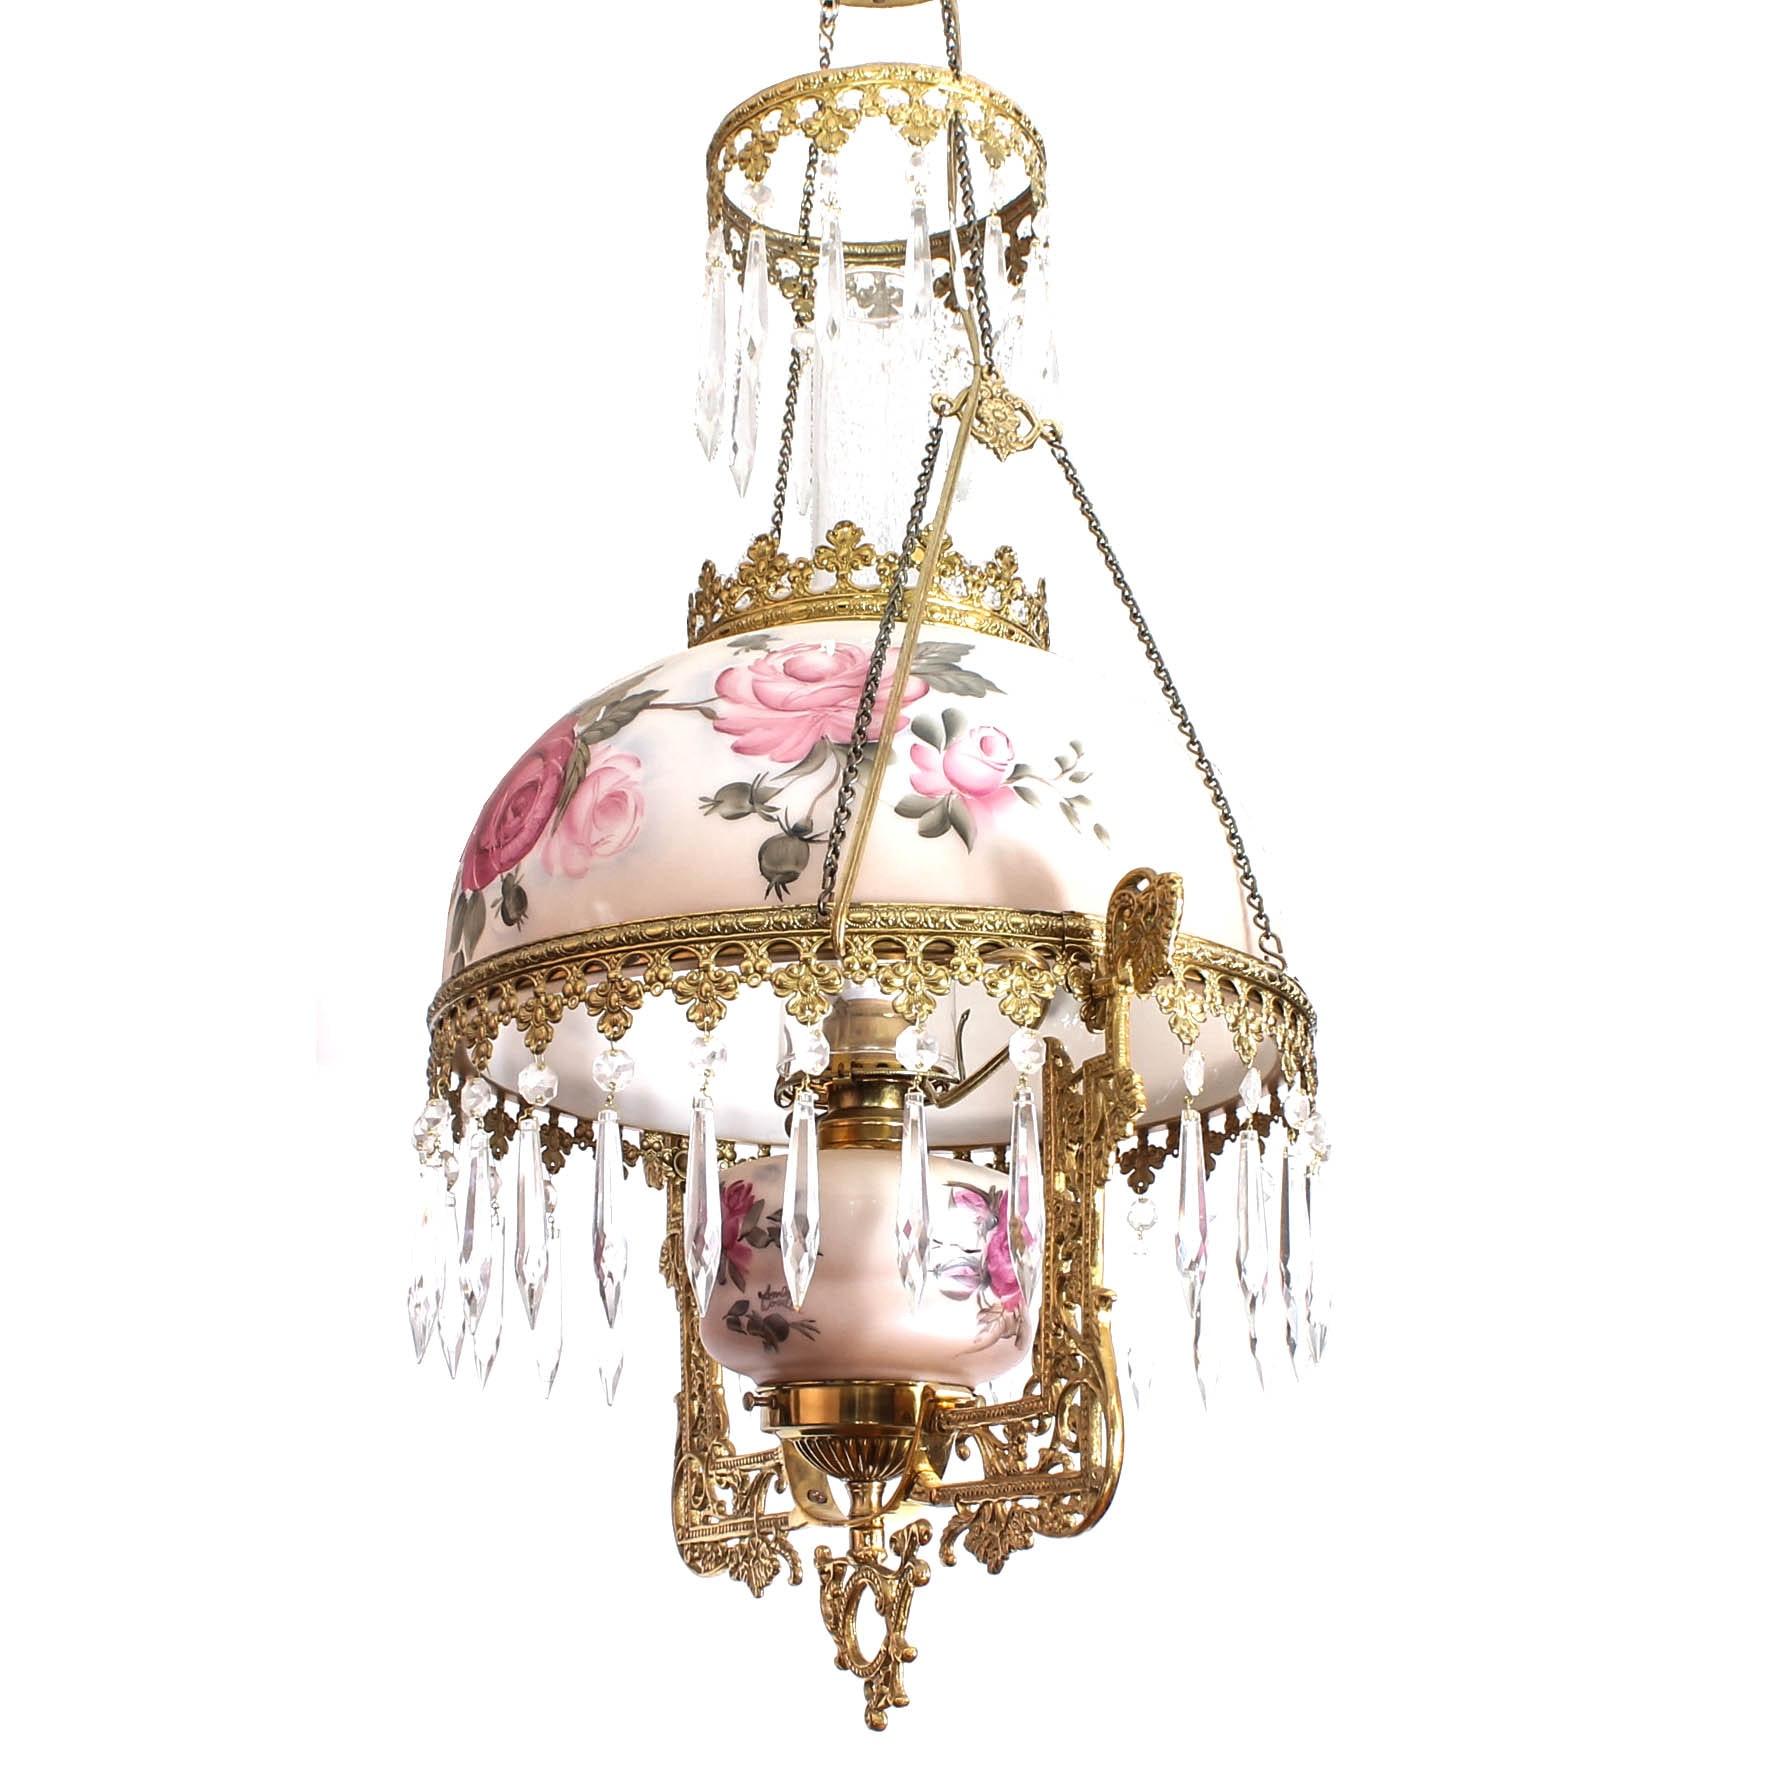 Victorian Style Lantern Ceiling Fixture